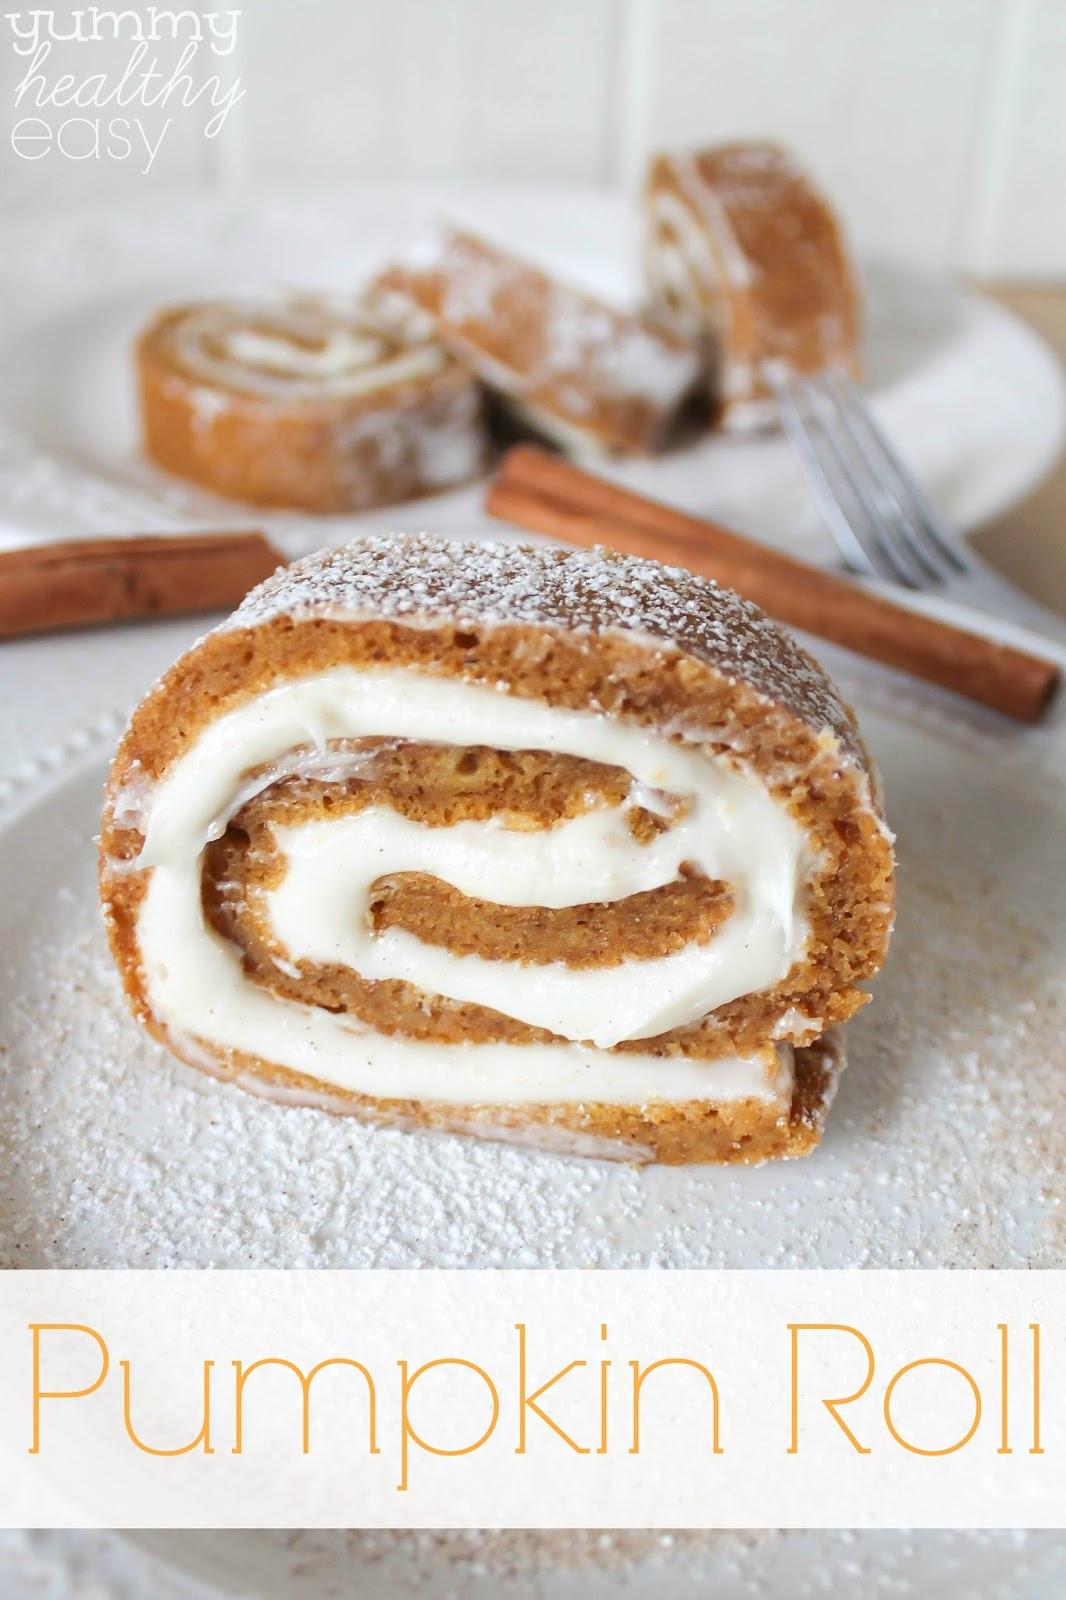 Easiest Desserts To Make  Easy Pumpkin Roll Dessert Yummy Healthy Easy